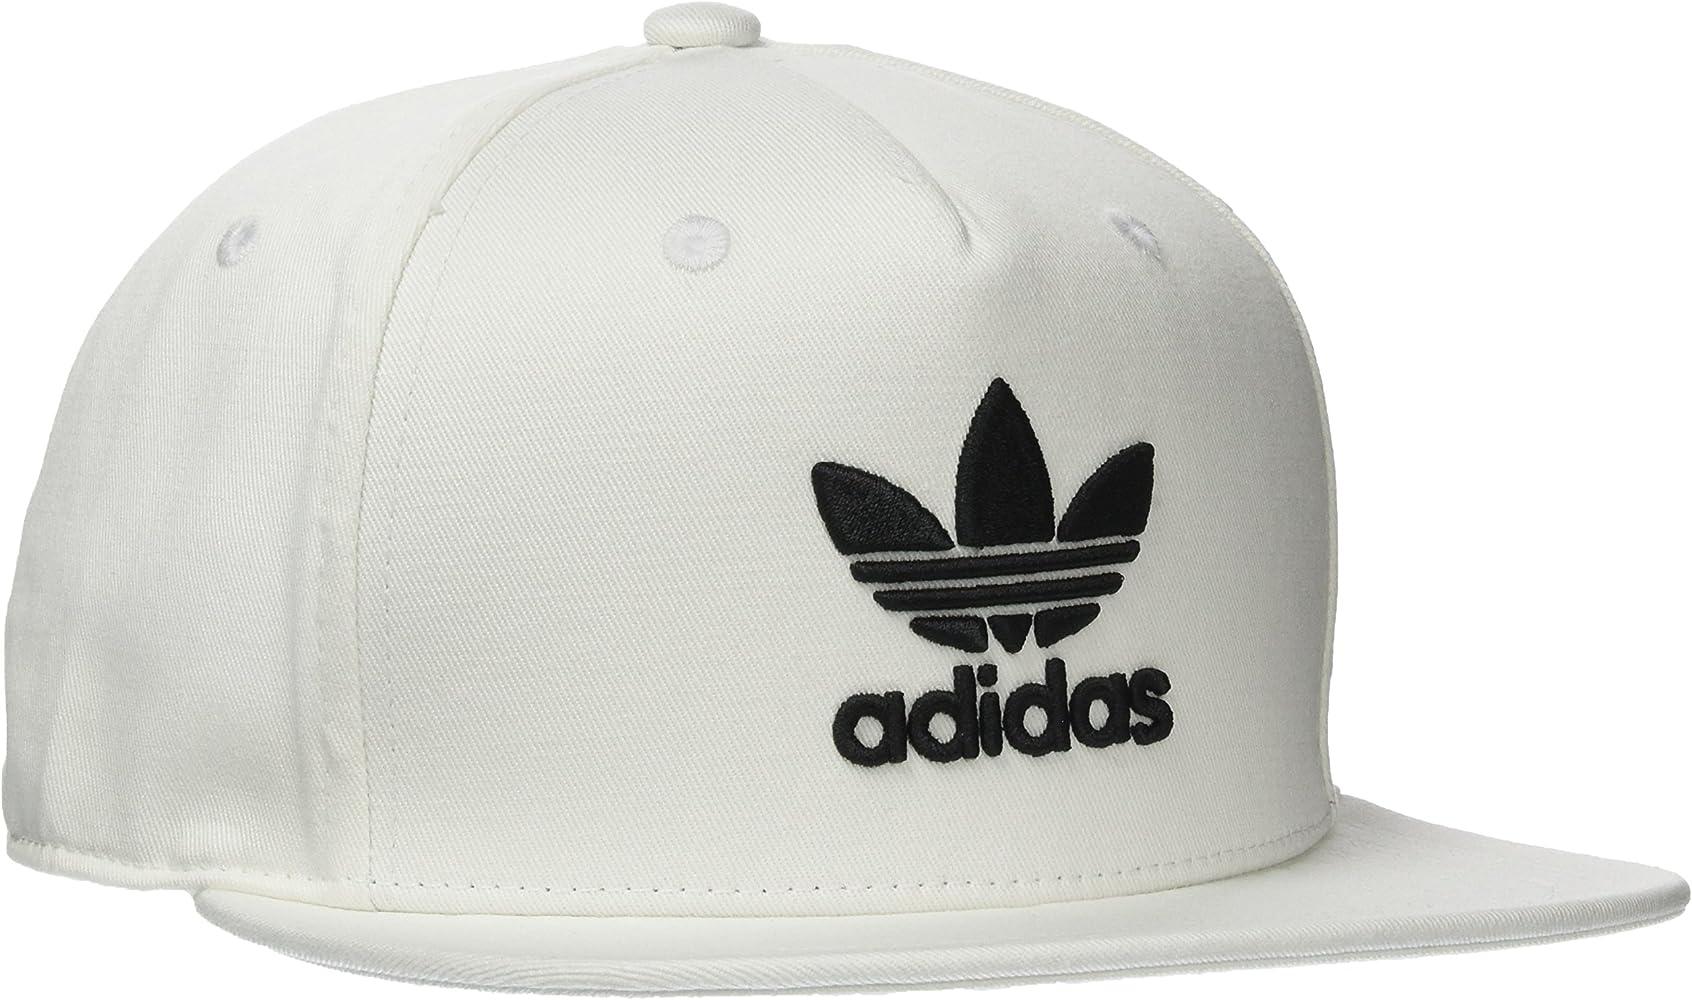 adidas AC Tre Flat Gorra, , Blanco / Negro, OSFW: Amazon.es: Ropa ...